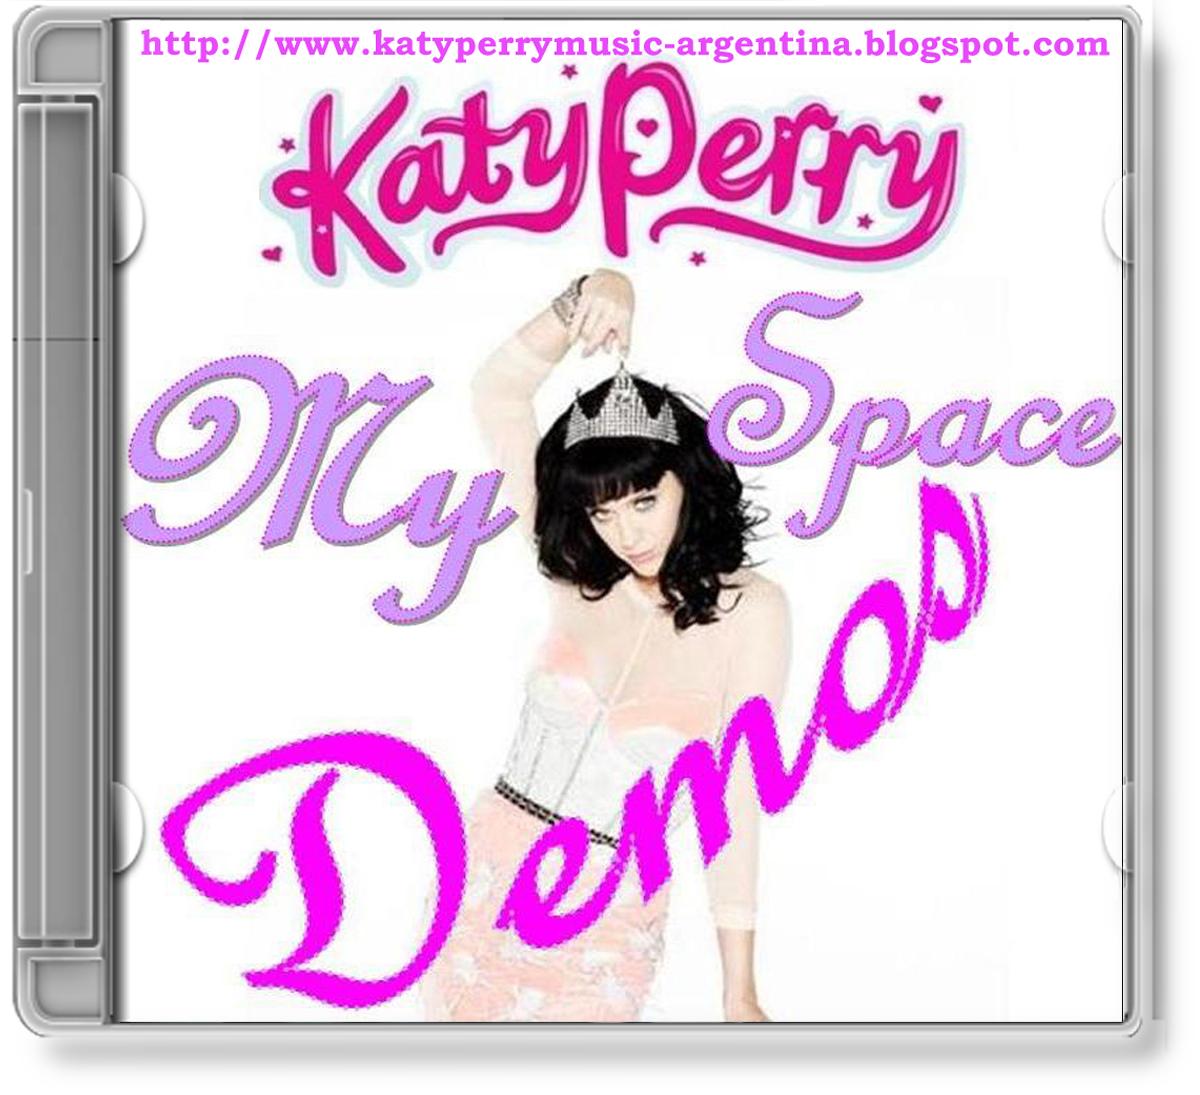 http://4.bp.blogspot.com/_mi1dvg0RzGg/TUK-gCdv4gI/AAAAAAAAAAs/P97TZnLEbkg/s1600/Katy+Perry+-+MySpace+Demos+%255BMP3%255D.jpg